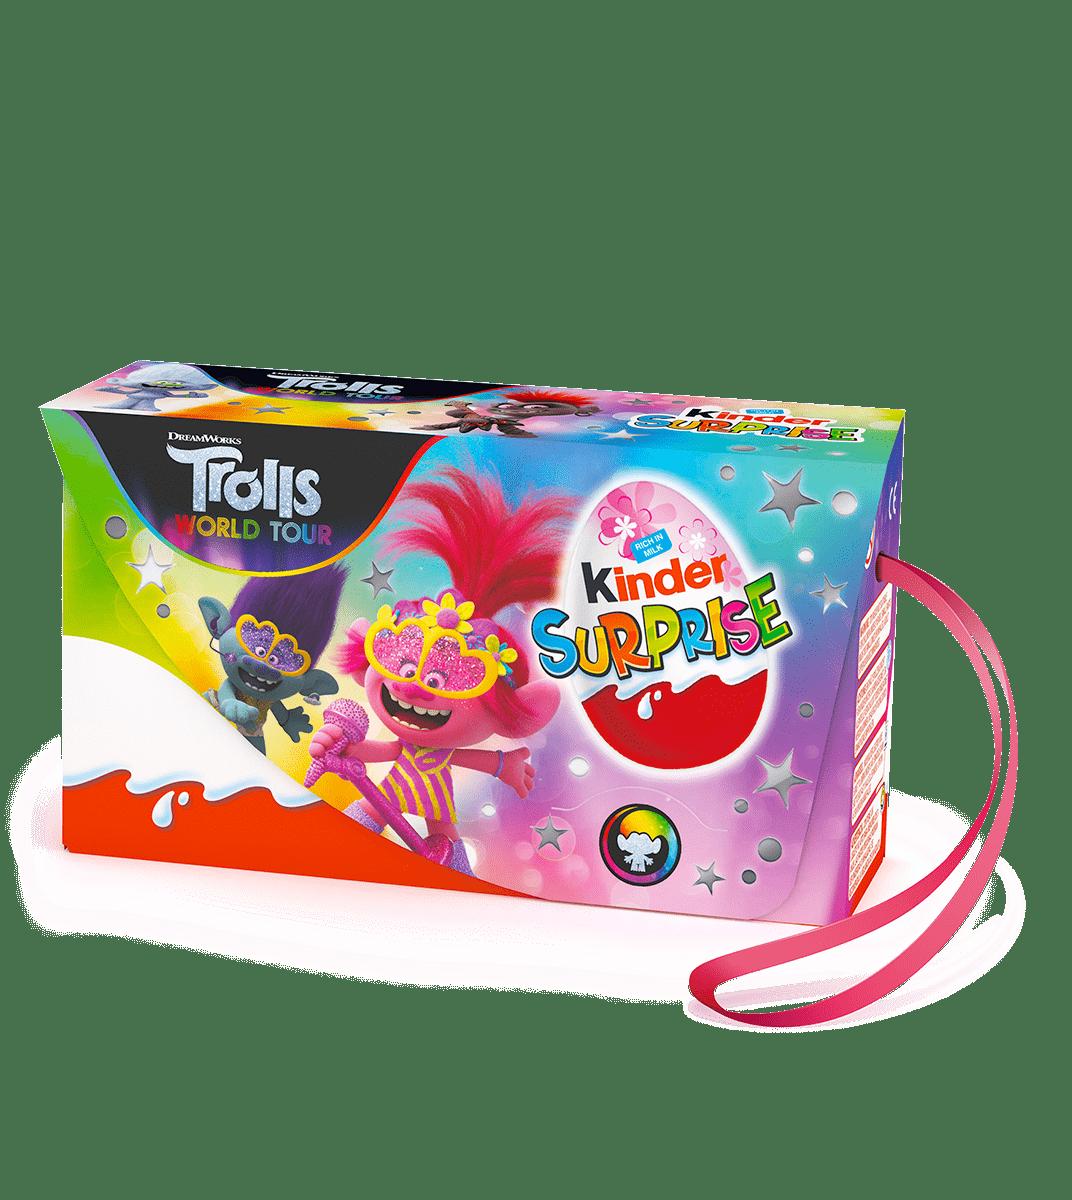 Kinder Surprise Trolls 60g (3 eggs)